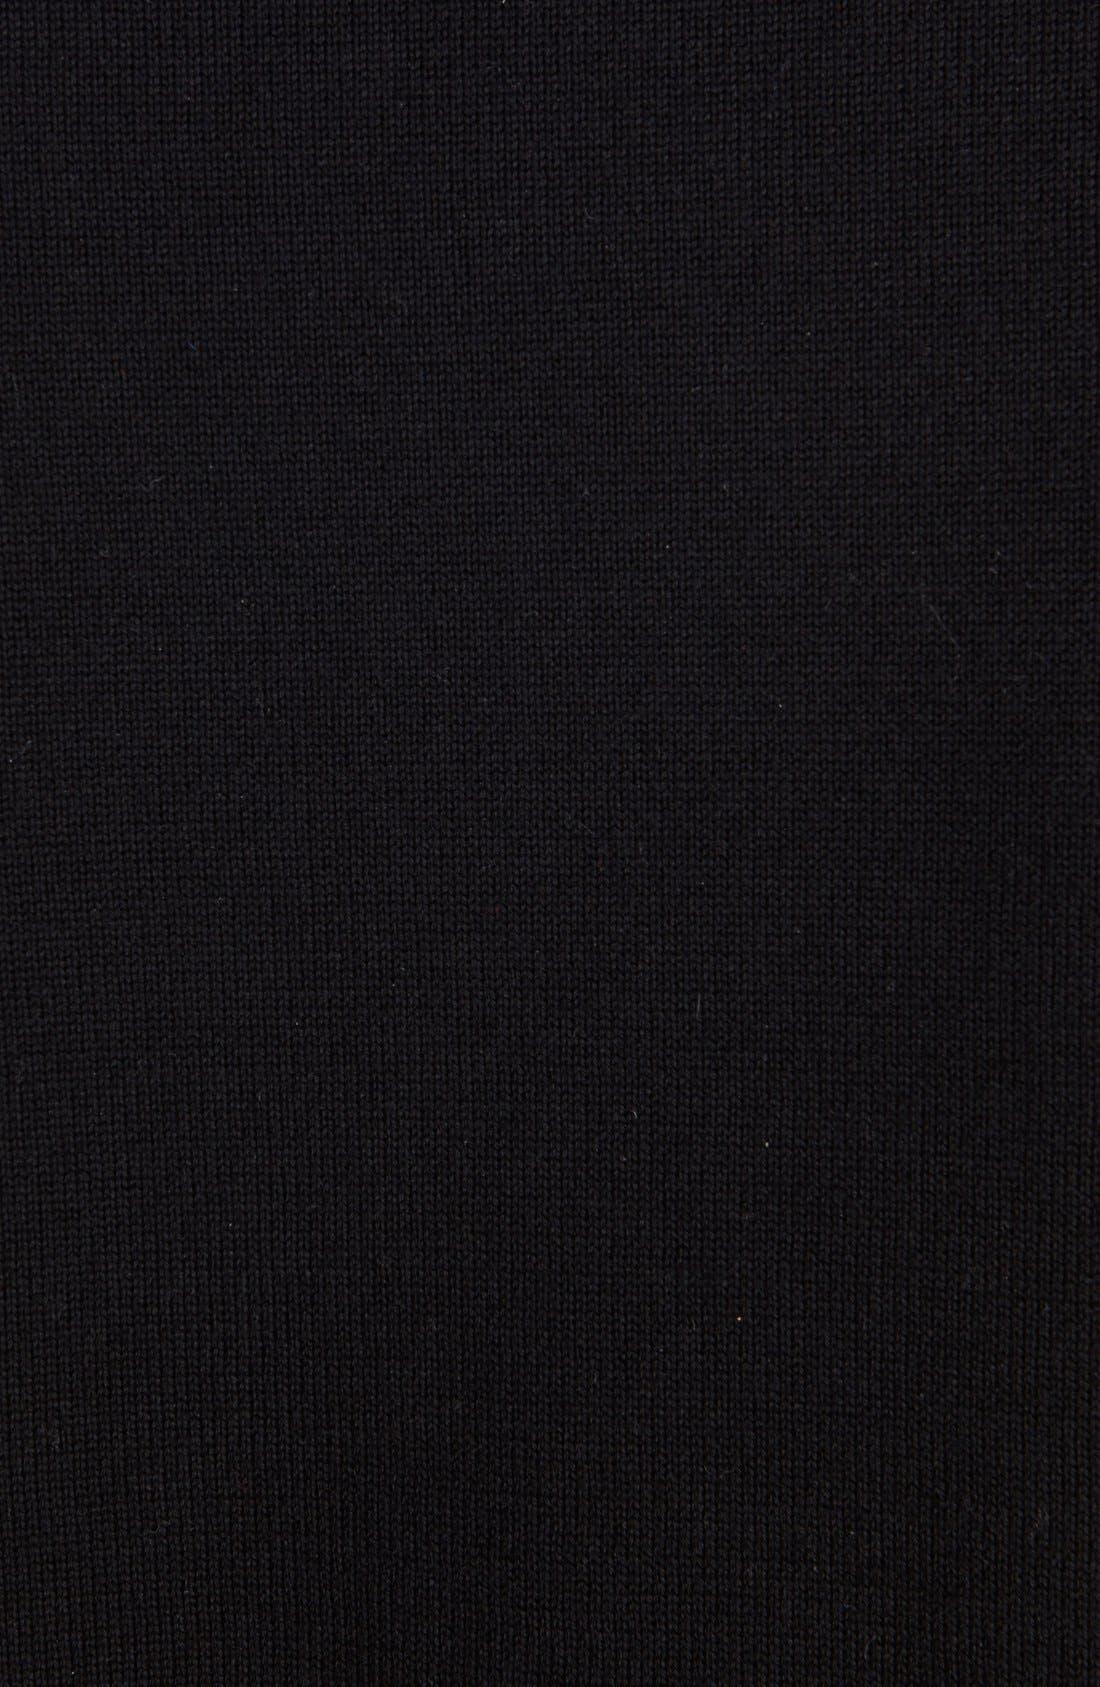 Wool Blend Intarsia Sweater,                             Alternate thumbnail 3, color,                             Black